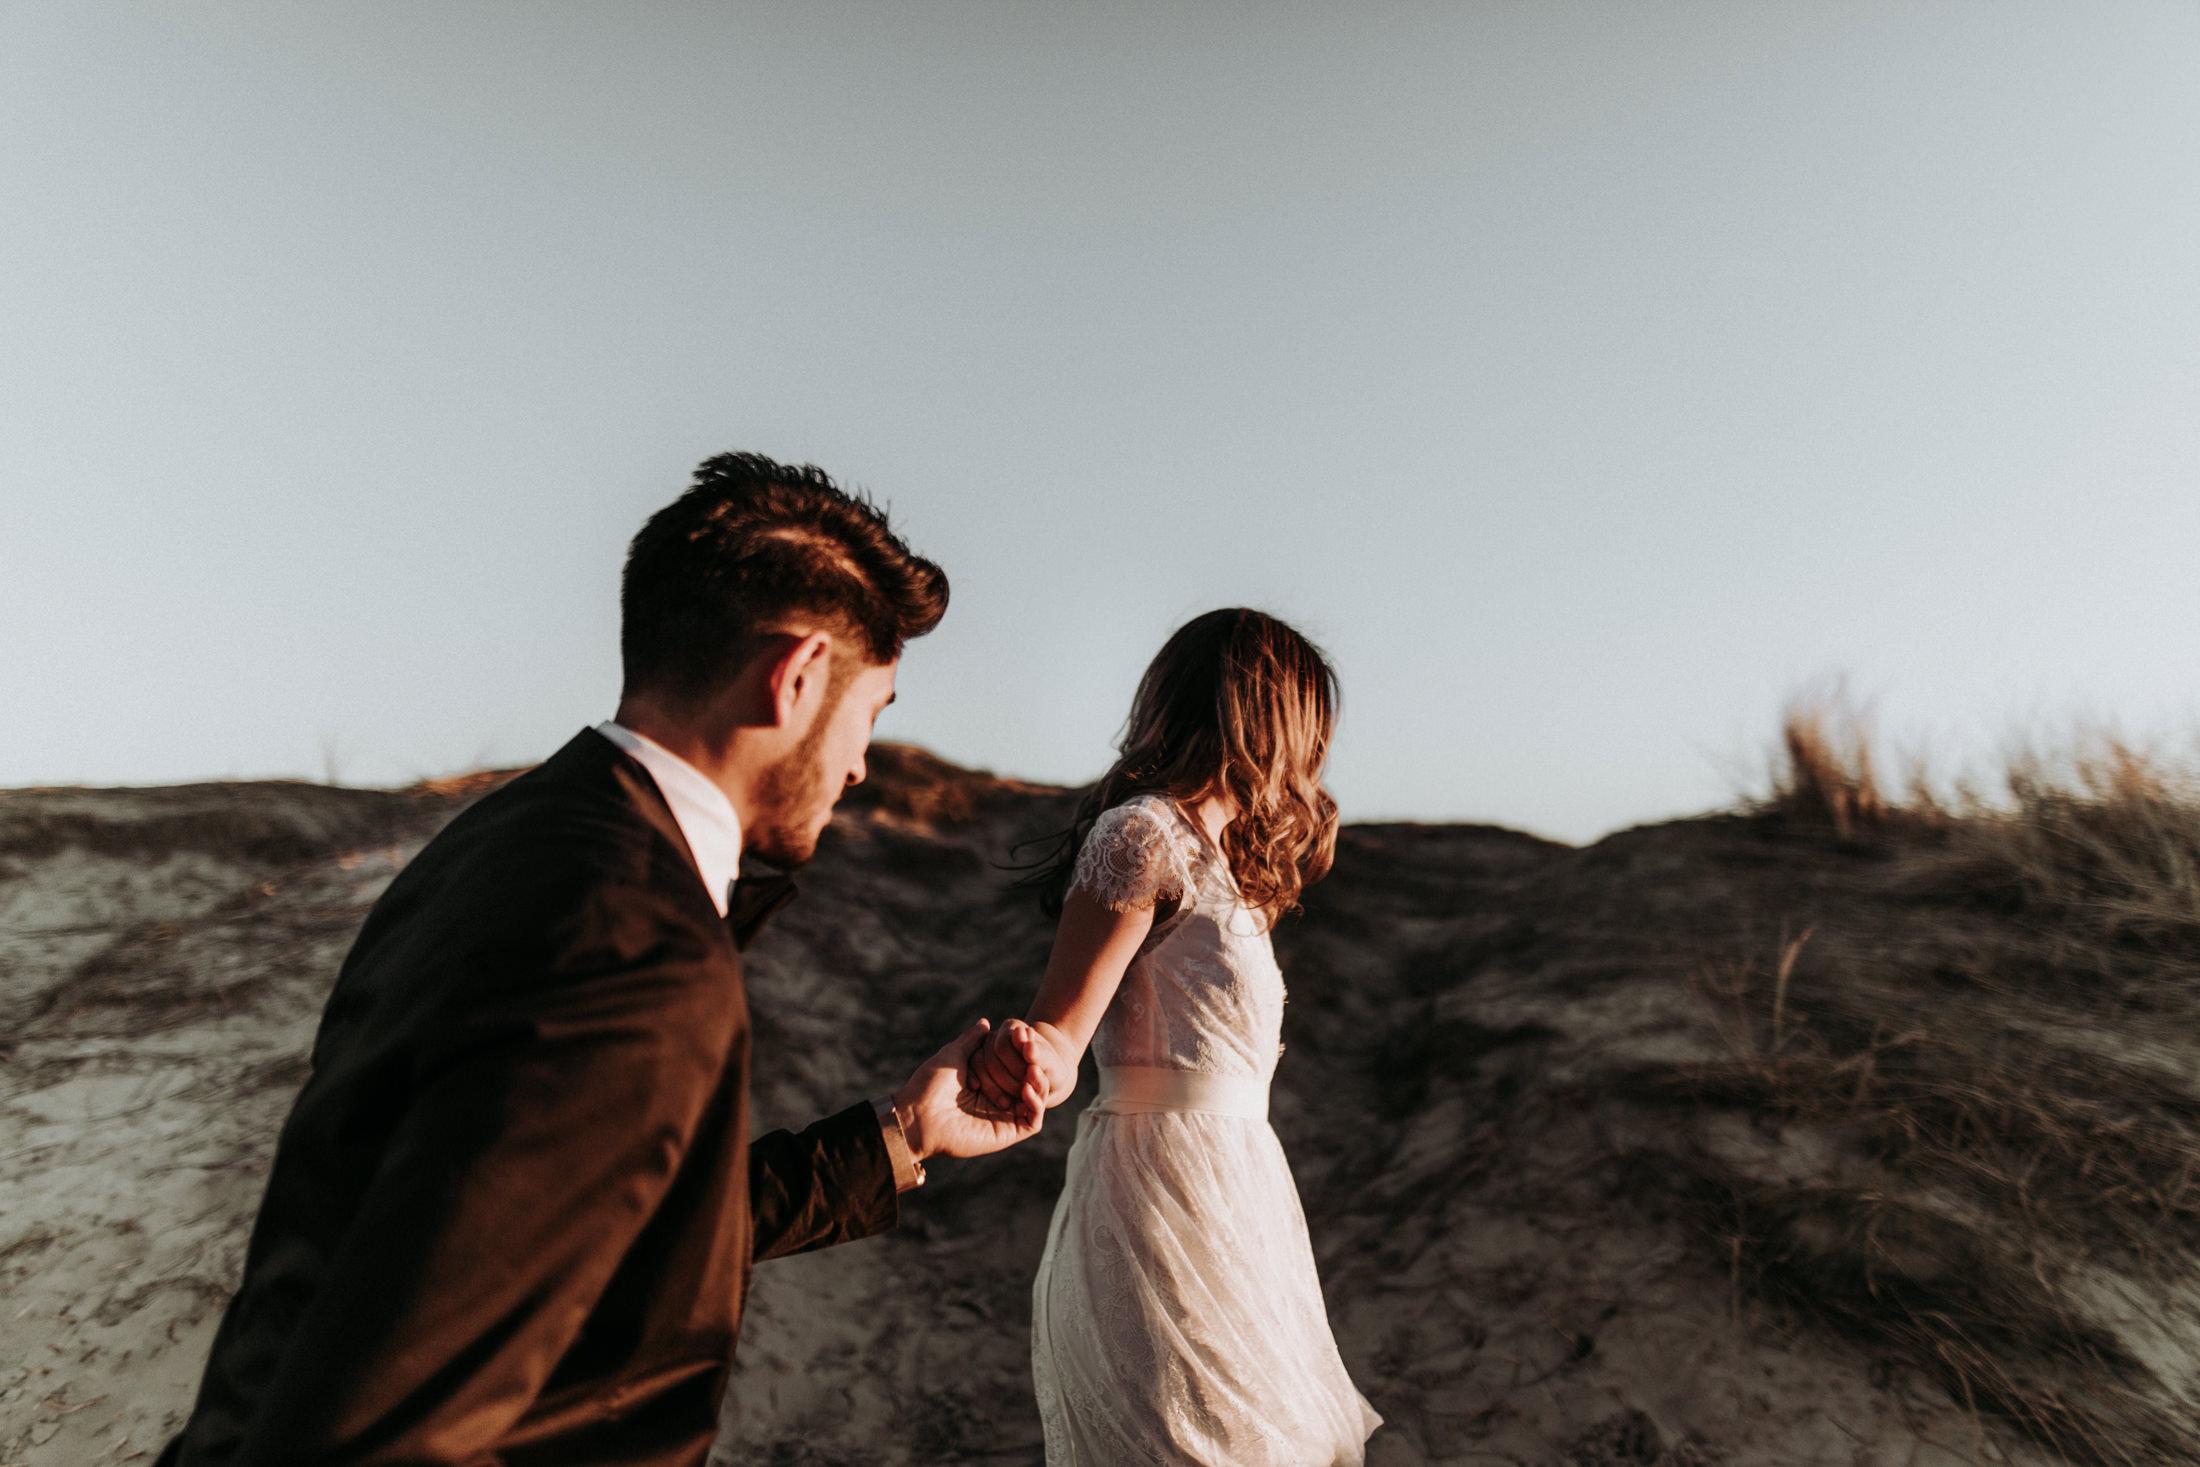 Wedding_Photographer_Mallorca_Daniela-Marquardt_Photography_CanaryIslands_Lanzarote_Iceland_Tuskany_Santorini_Portugal_Schweiz_Austria_Bayern_Elopement_Hochzeitsfotograf_Norddeichich_40